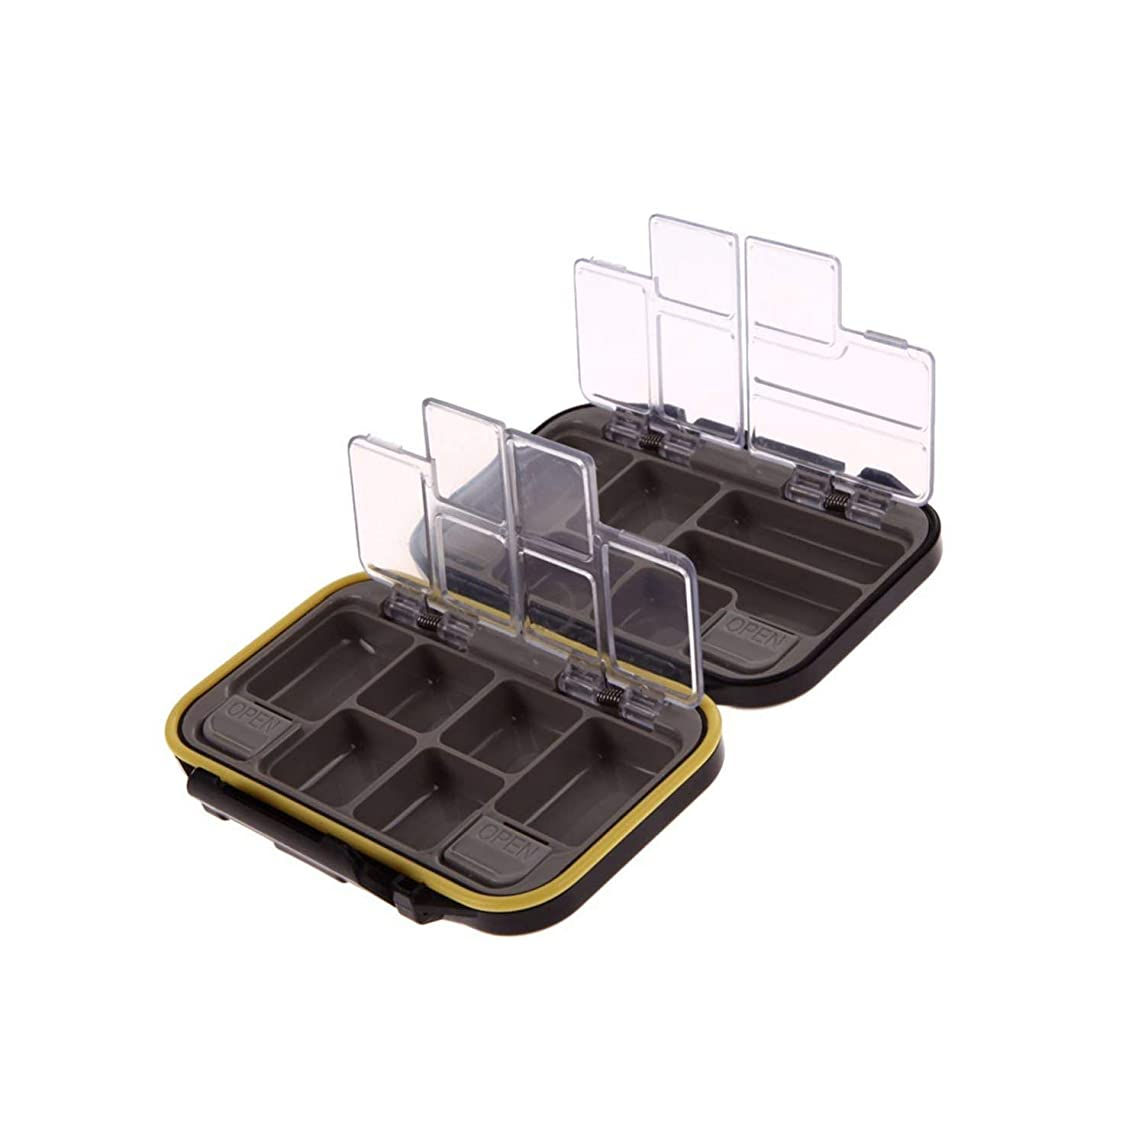 Fishing-Tackle-Boxes12 Compartments Waterproof Fishing Tackle Storage Box Eco-Friendly Plastic Fishing Lure Bait Tackle Durable Fish Pocket Box Bag